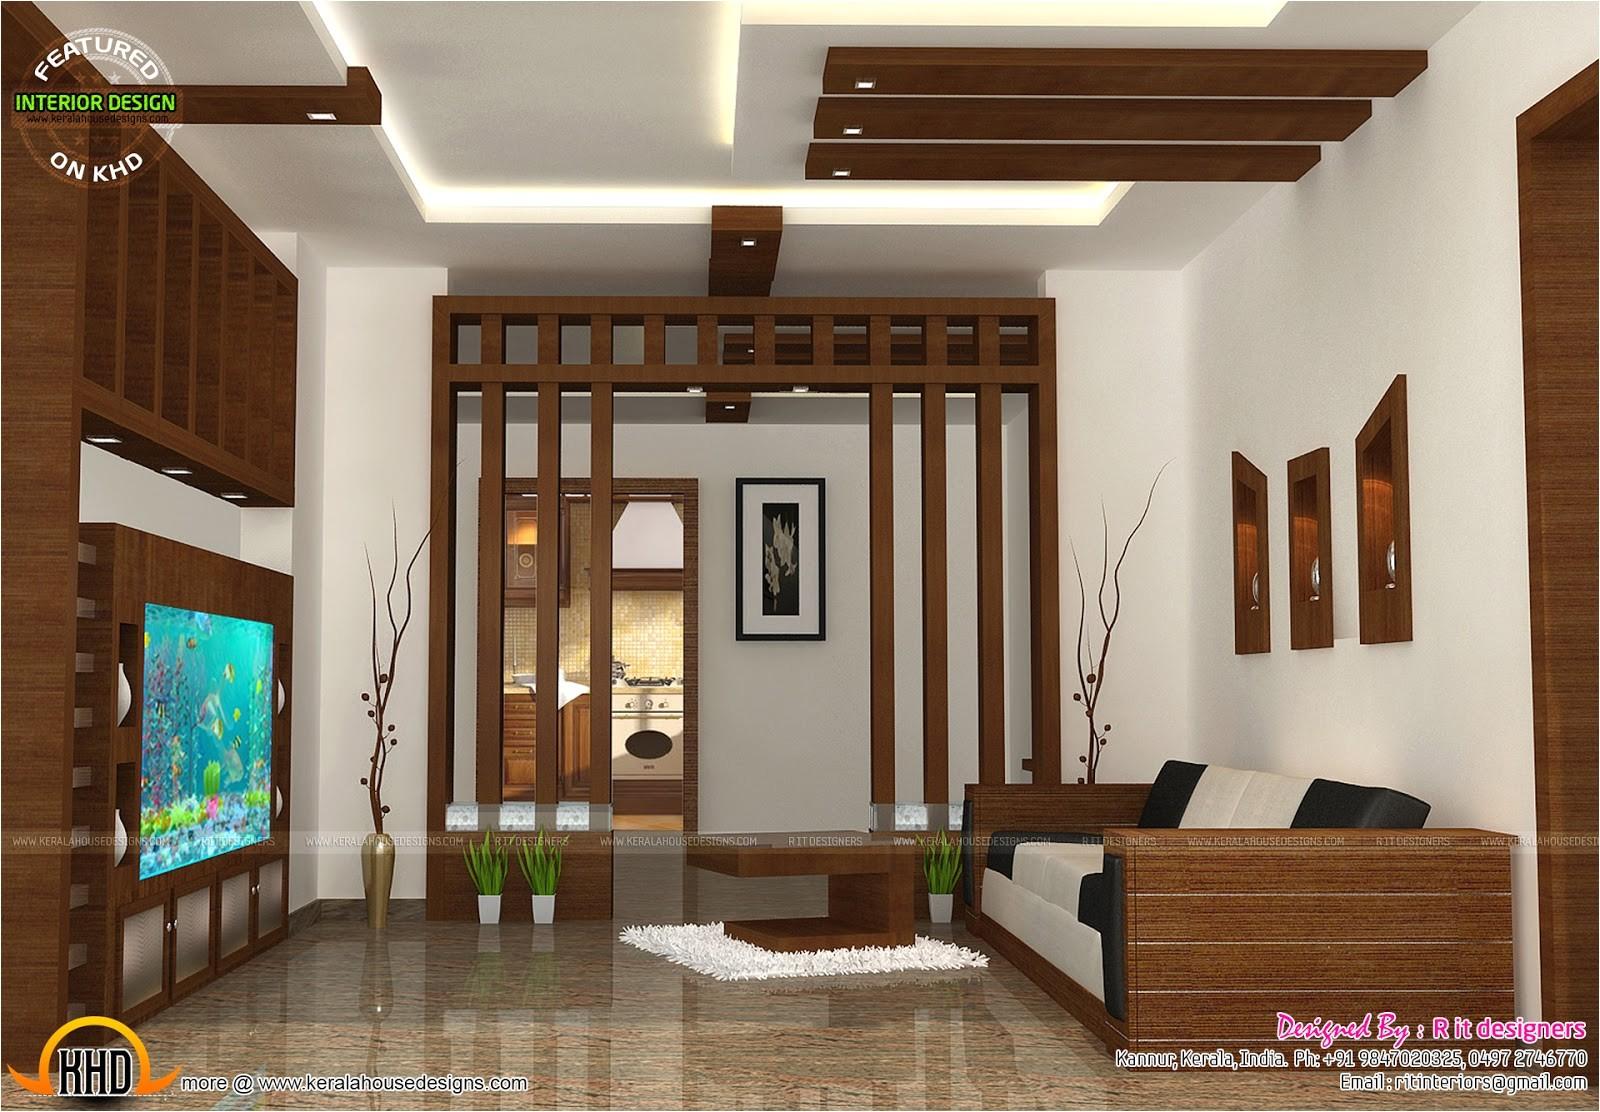 wooden finish interiors